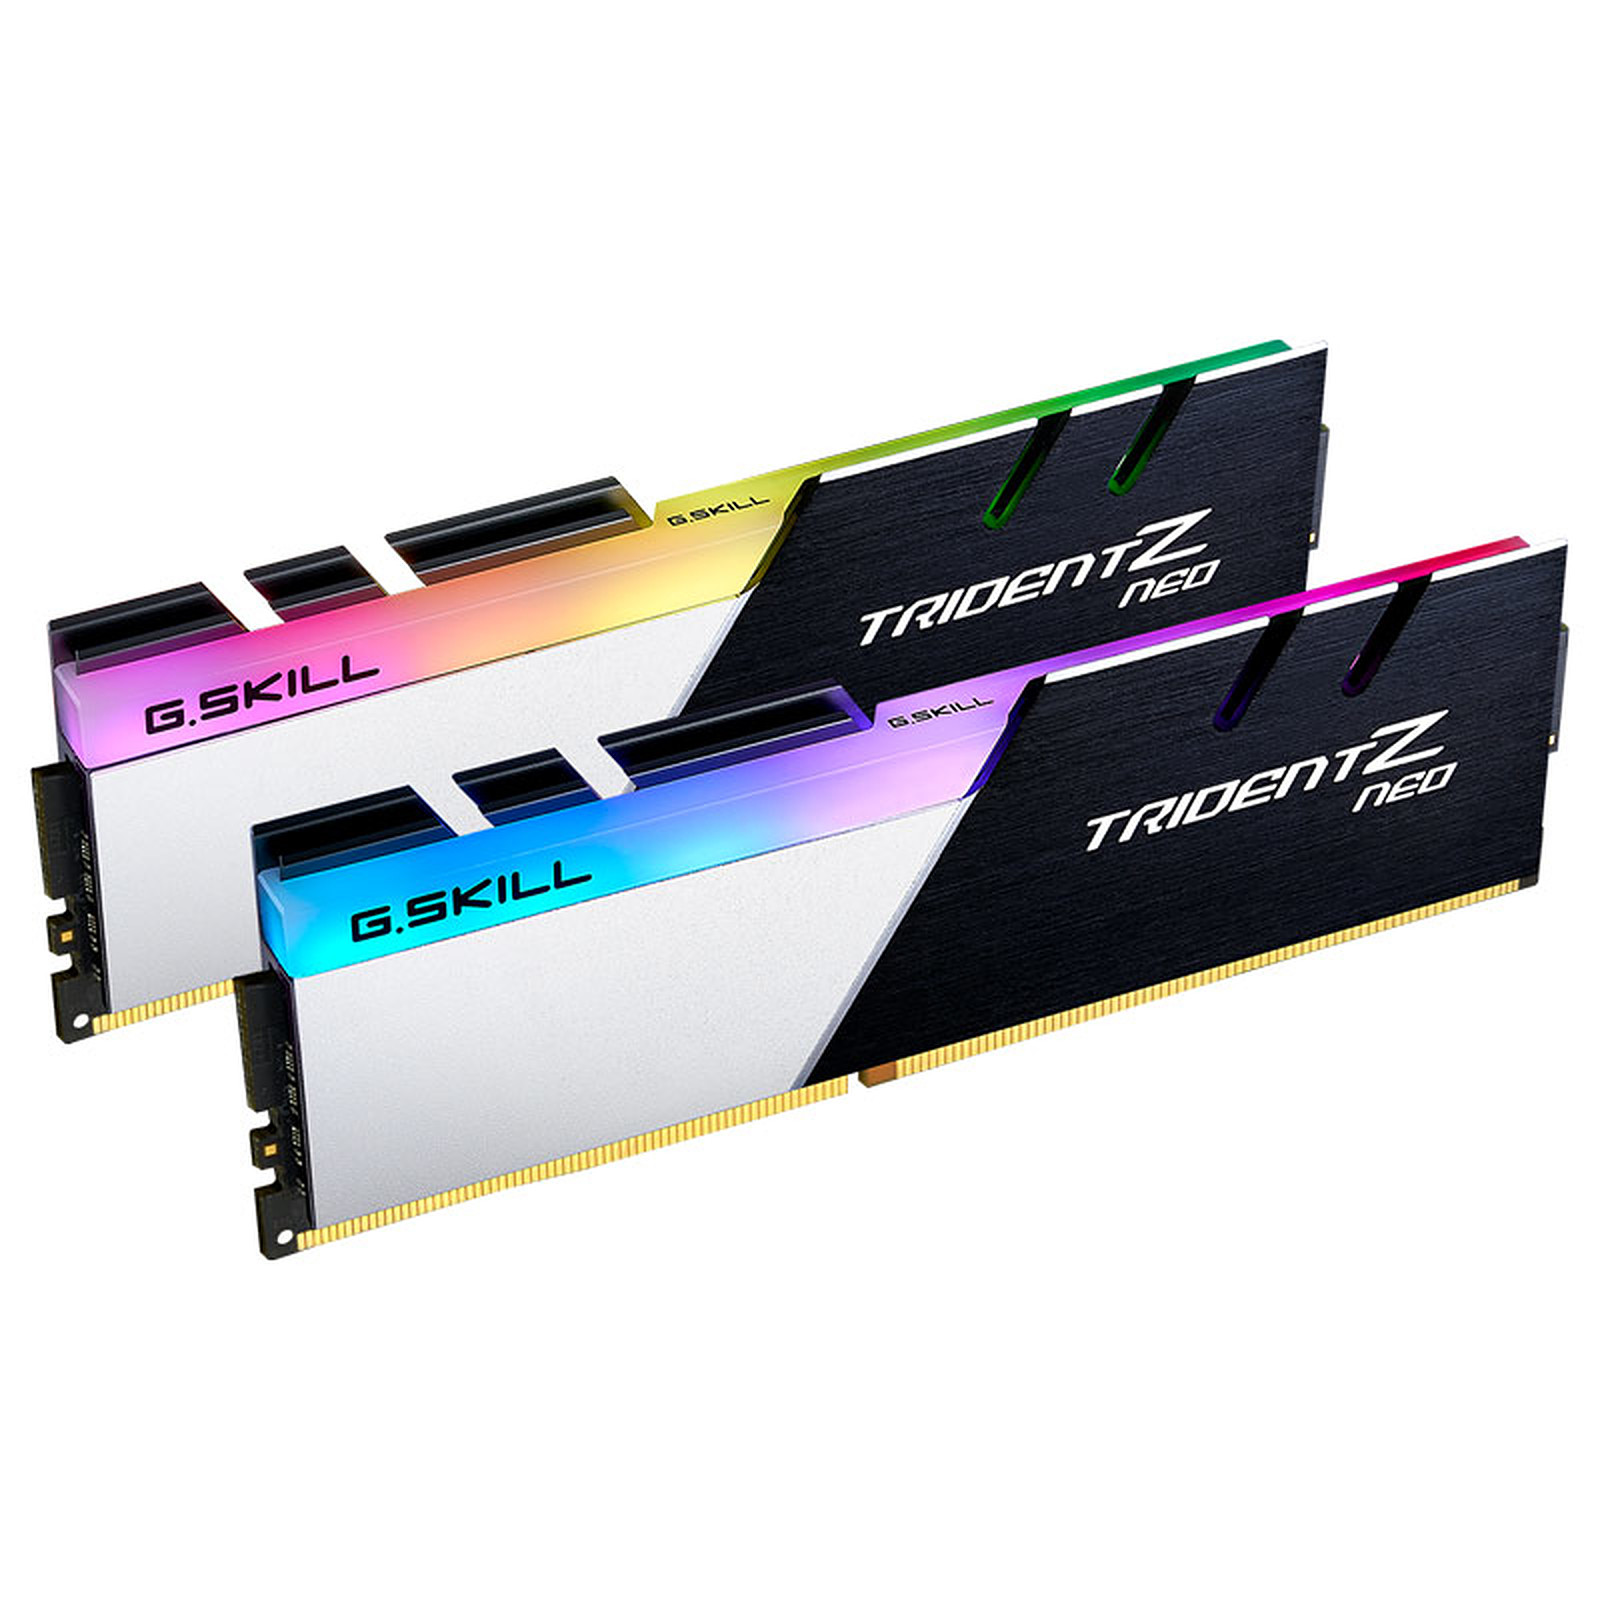 G.Skill Trident Z Neo 32 Go (2x 16 Go) DDR4 3600 MHz CL16